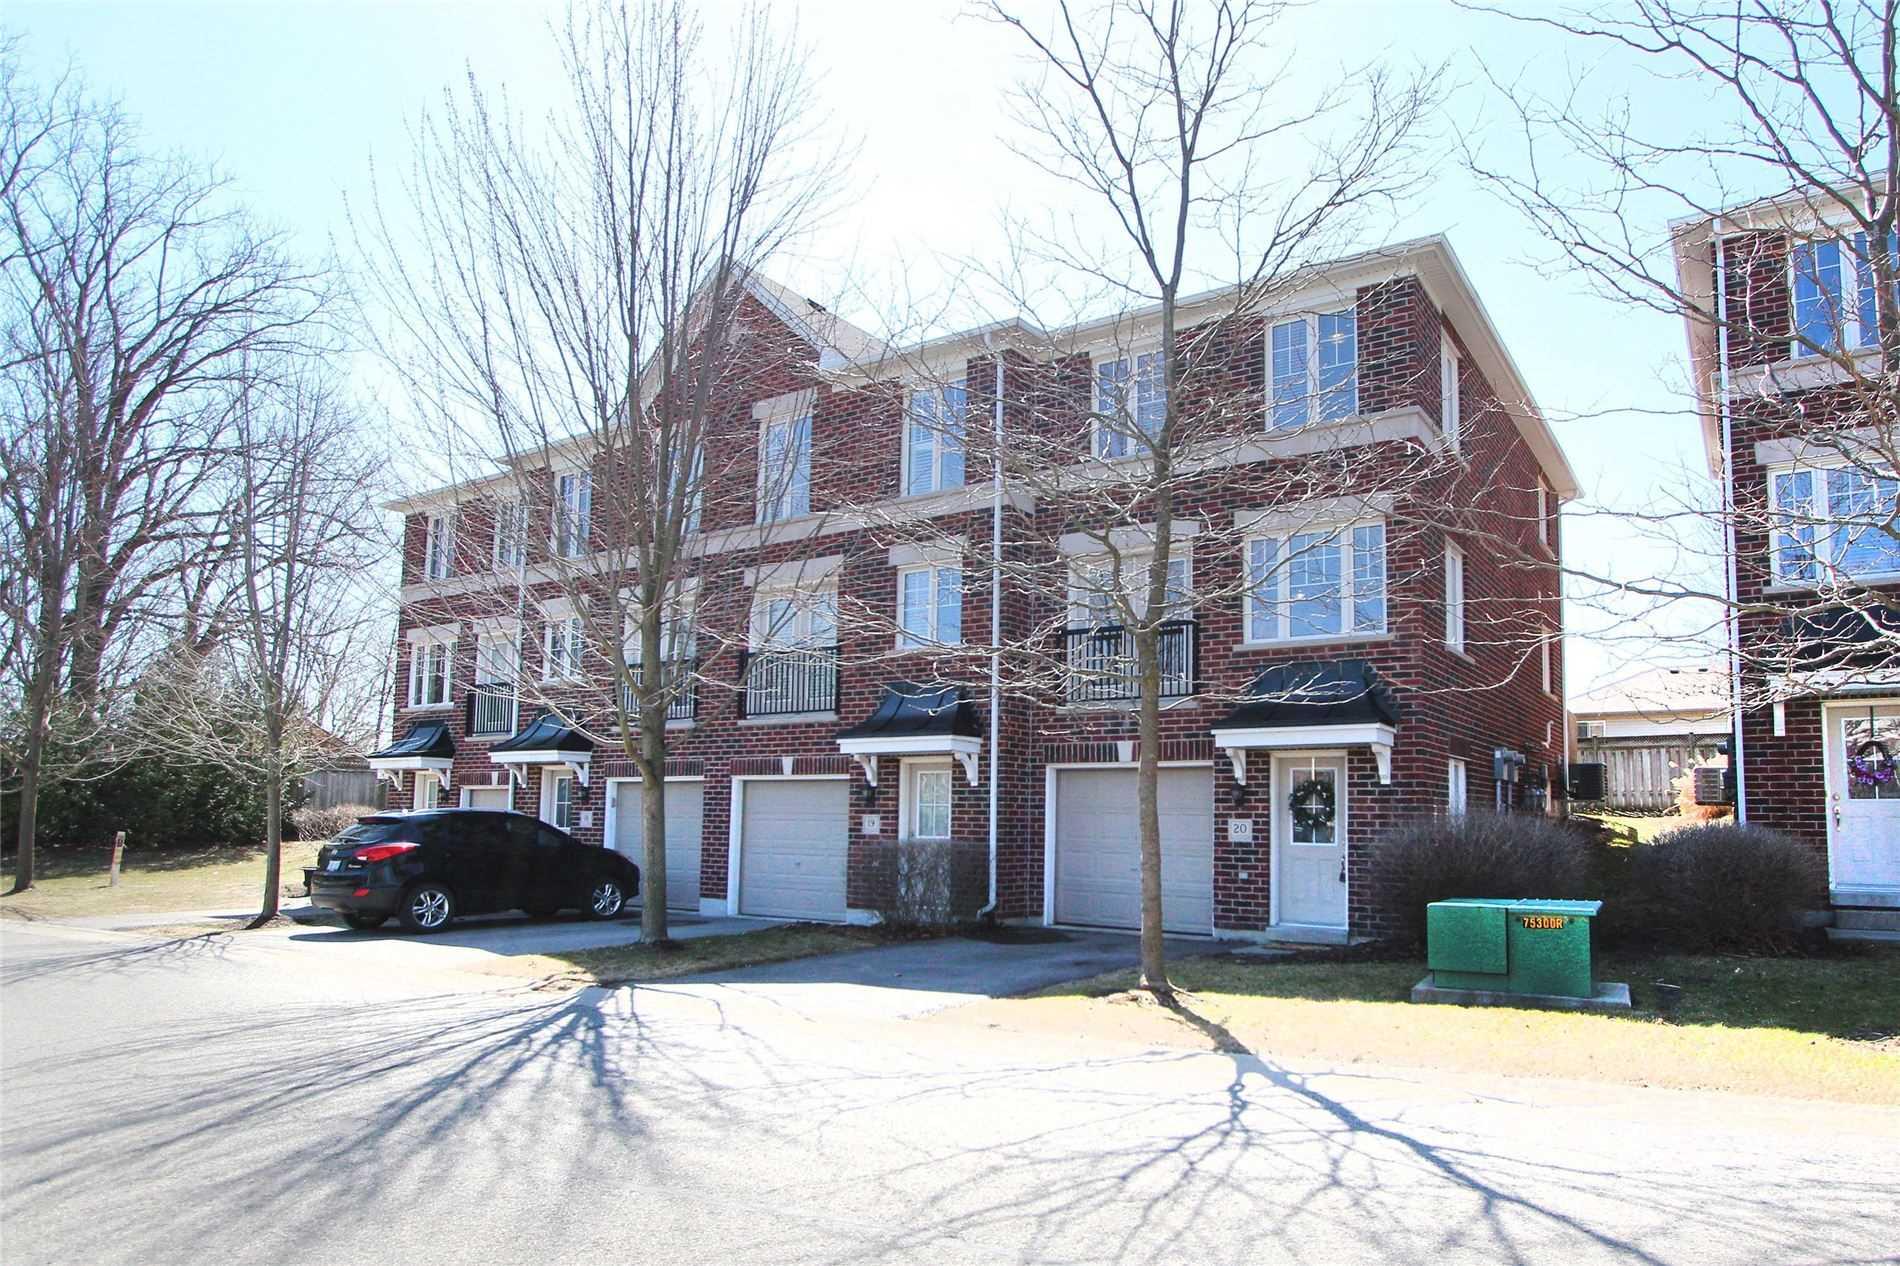 571 Longworth Ave, Clarington, Ontario L1C0H3, 3 Bedrooms Bedrooms, ,2 BathroomsBathrooms,Condo Townhouse,For Sale,Longworth,E5184811